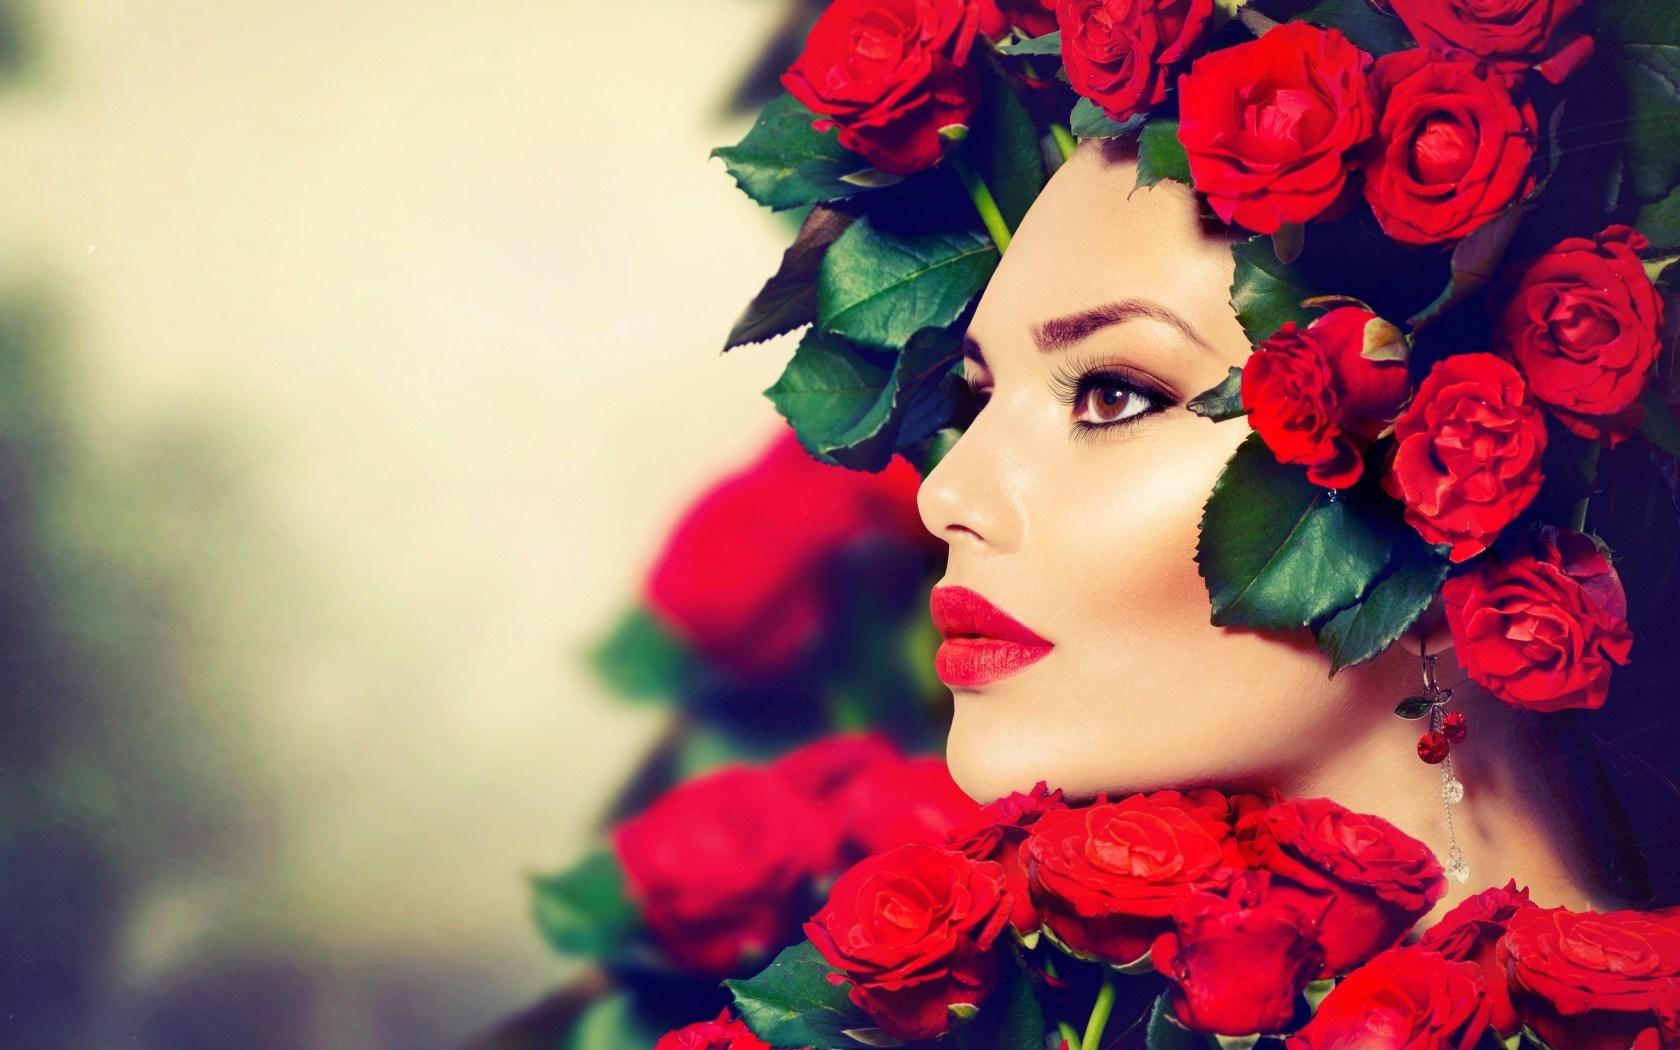 Girl Look Makeup Red Lips Roses